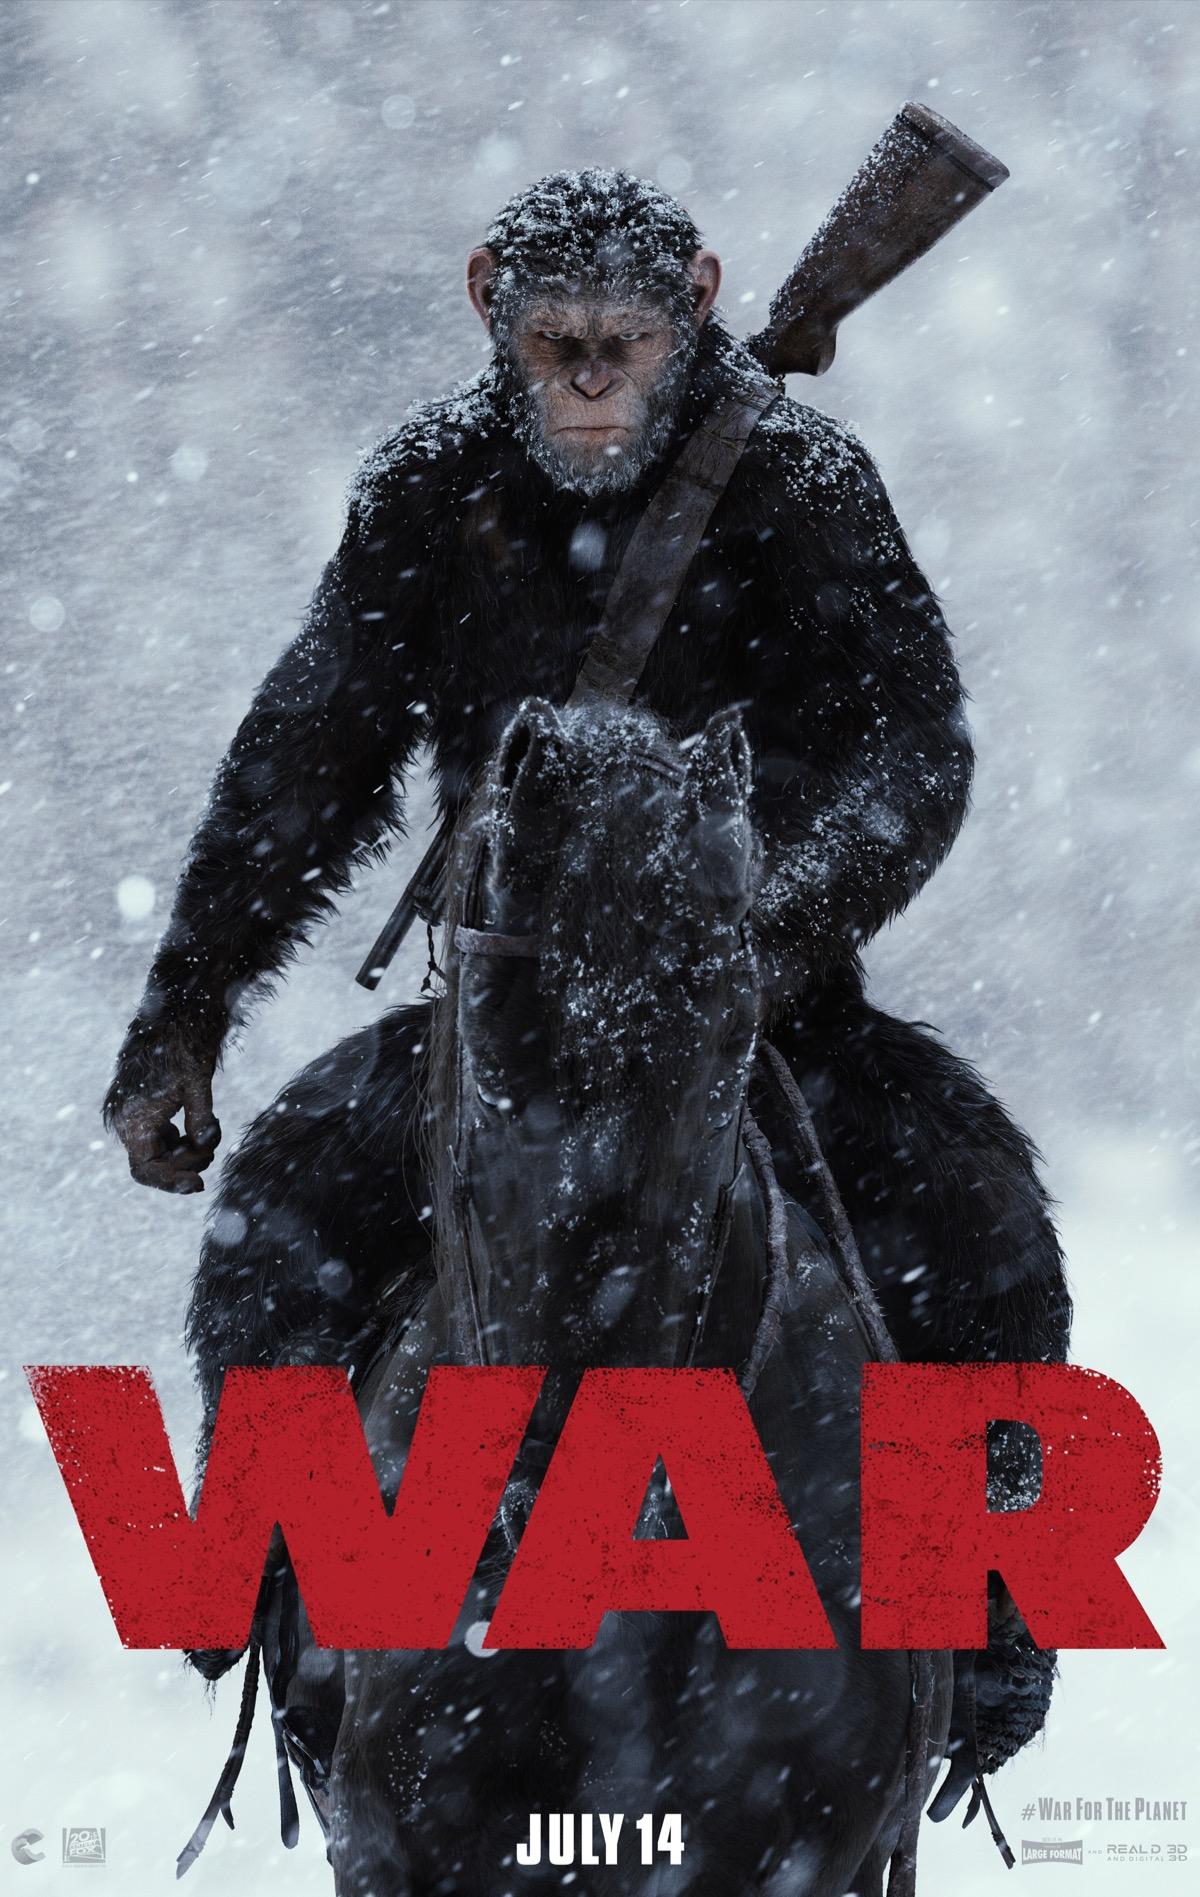 Planet der Affen Survival Trailer & Poster